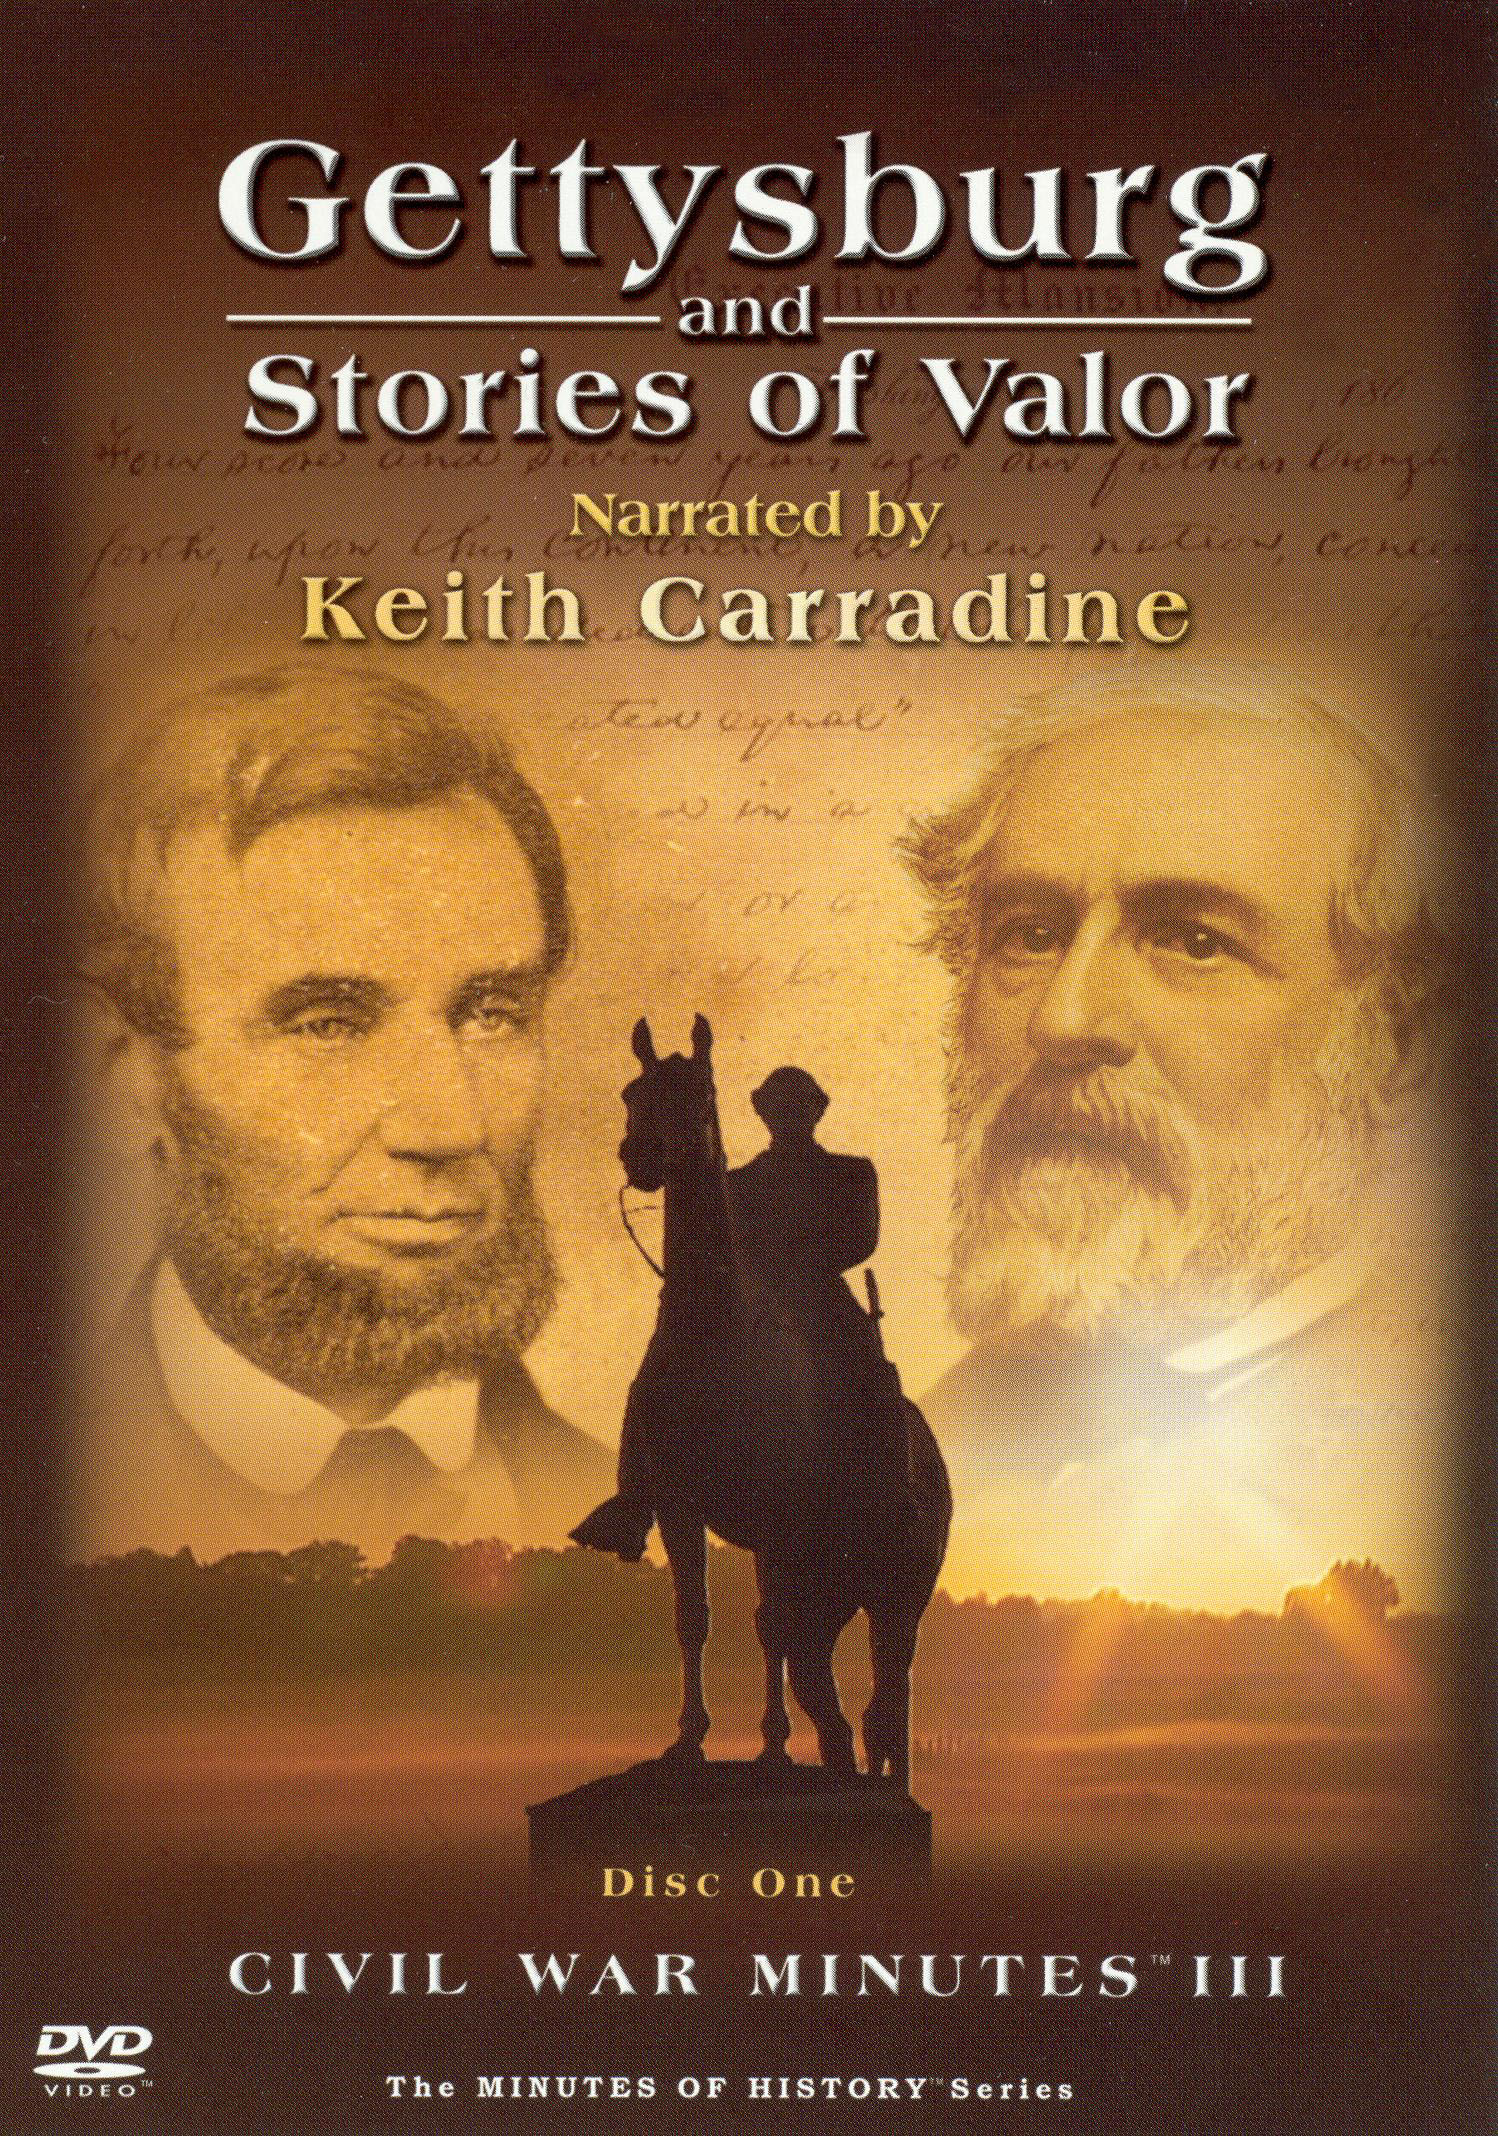 Civil War Minutes III: Gettysburg and Stories of Valor, Vol. 1